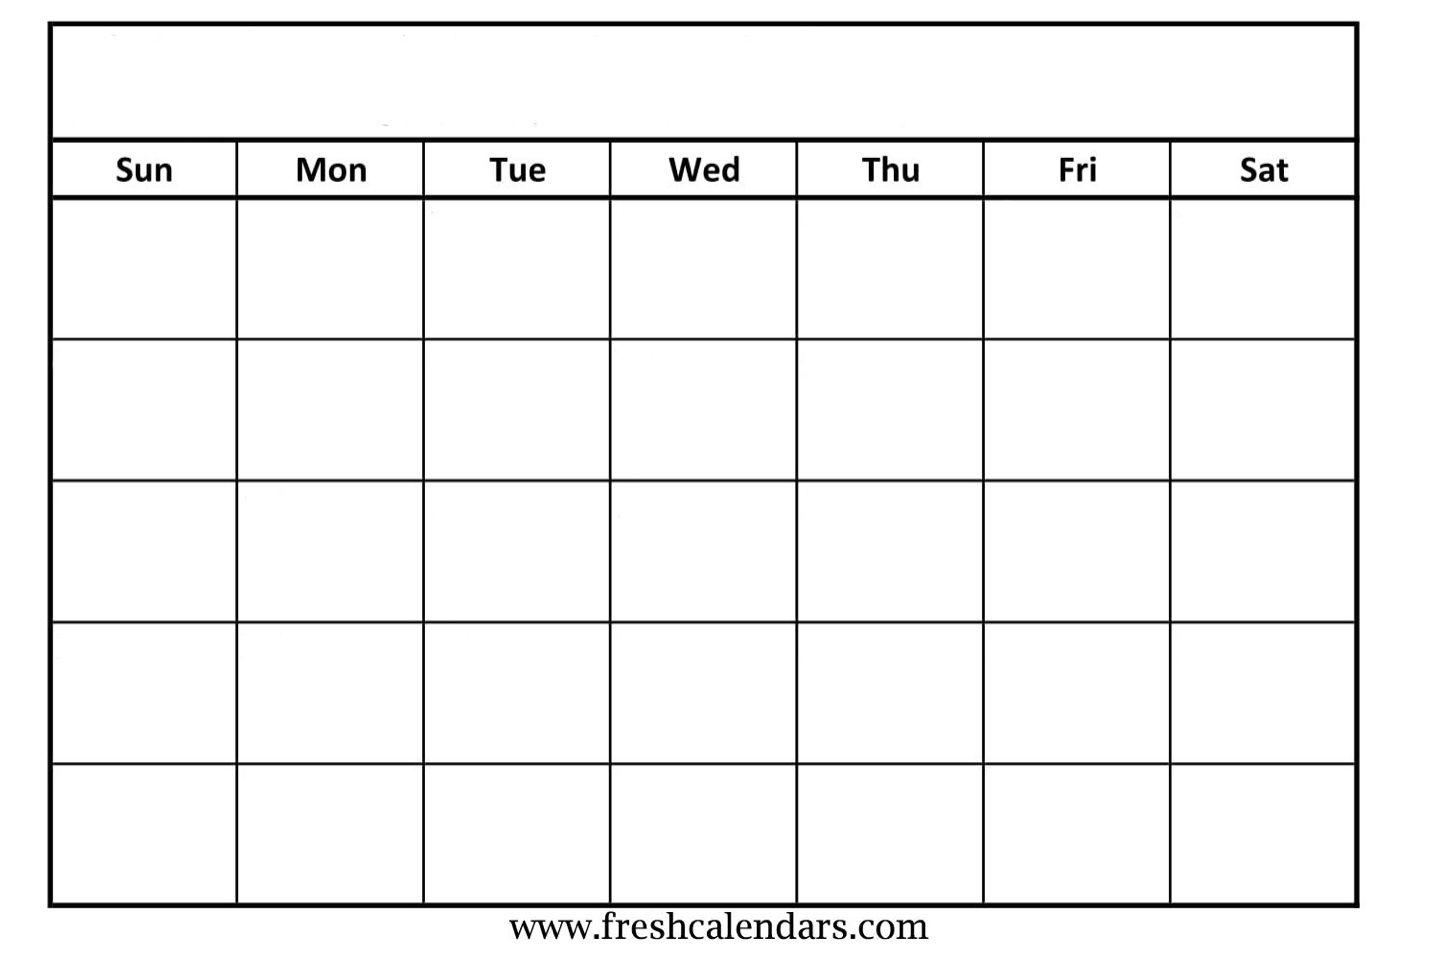 2019 Free Printable Calendar Templates - A Mother's Random